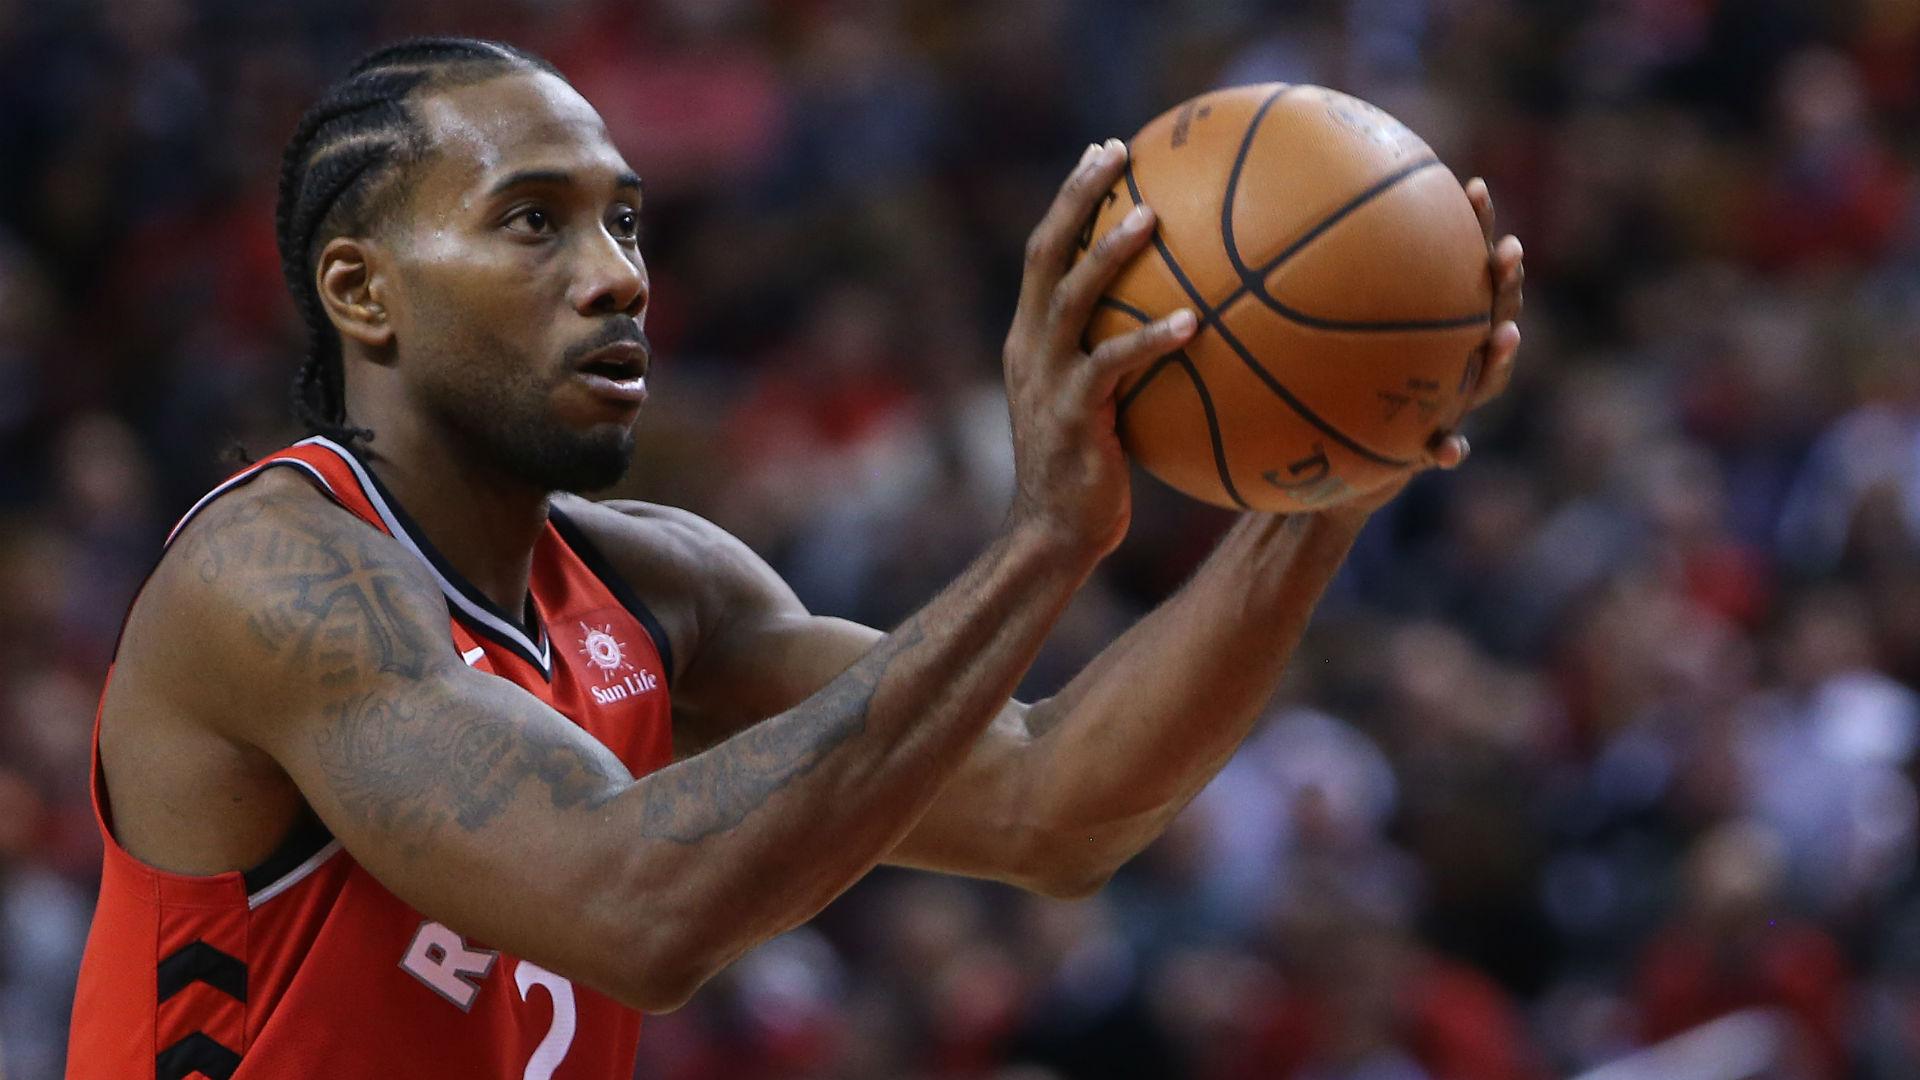 Kawhi Leonard: Kawhi Leonard Drops 35 Points, Raptors Tie Franchise